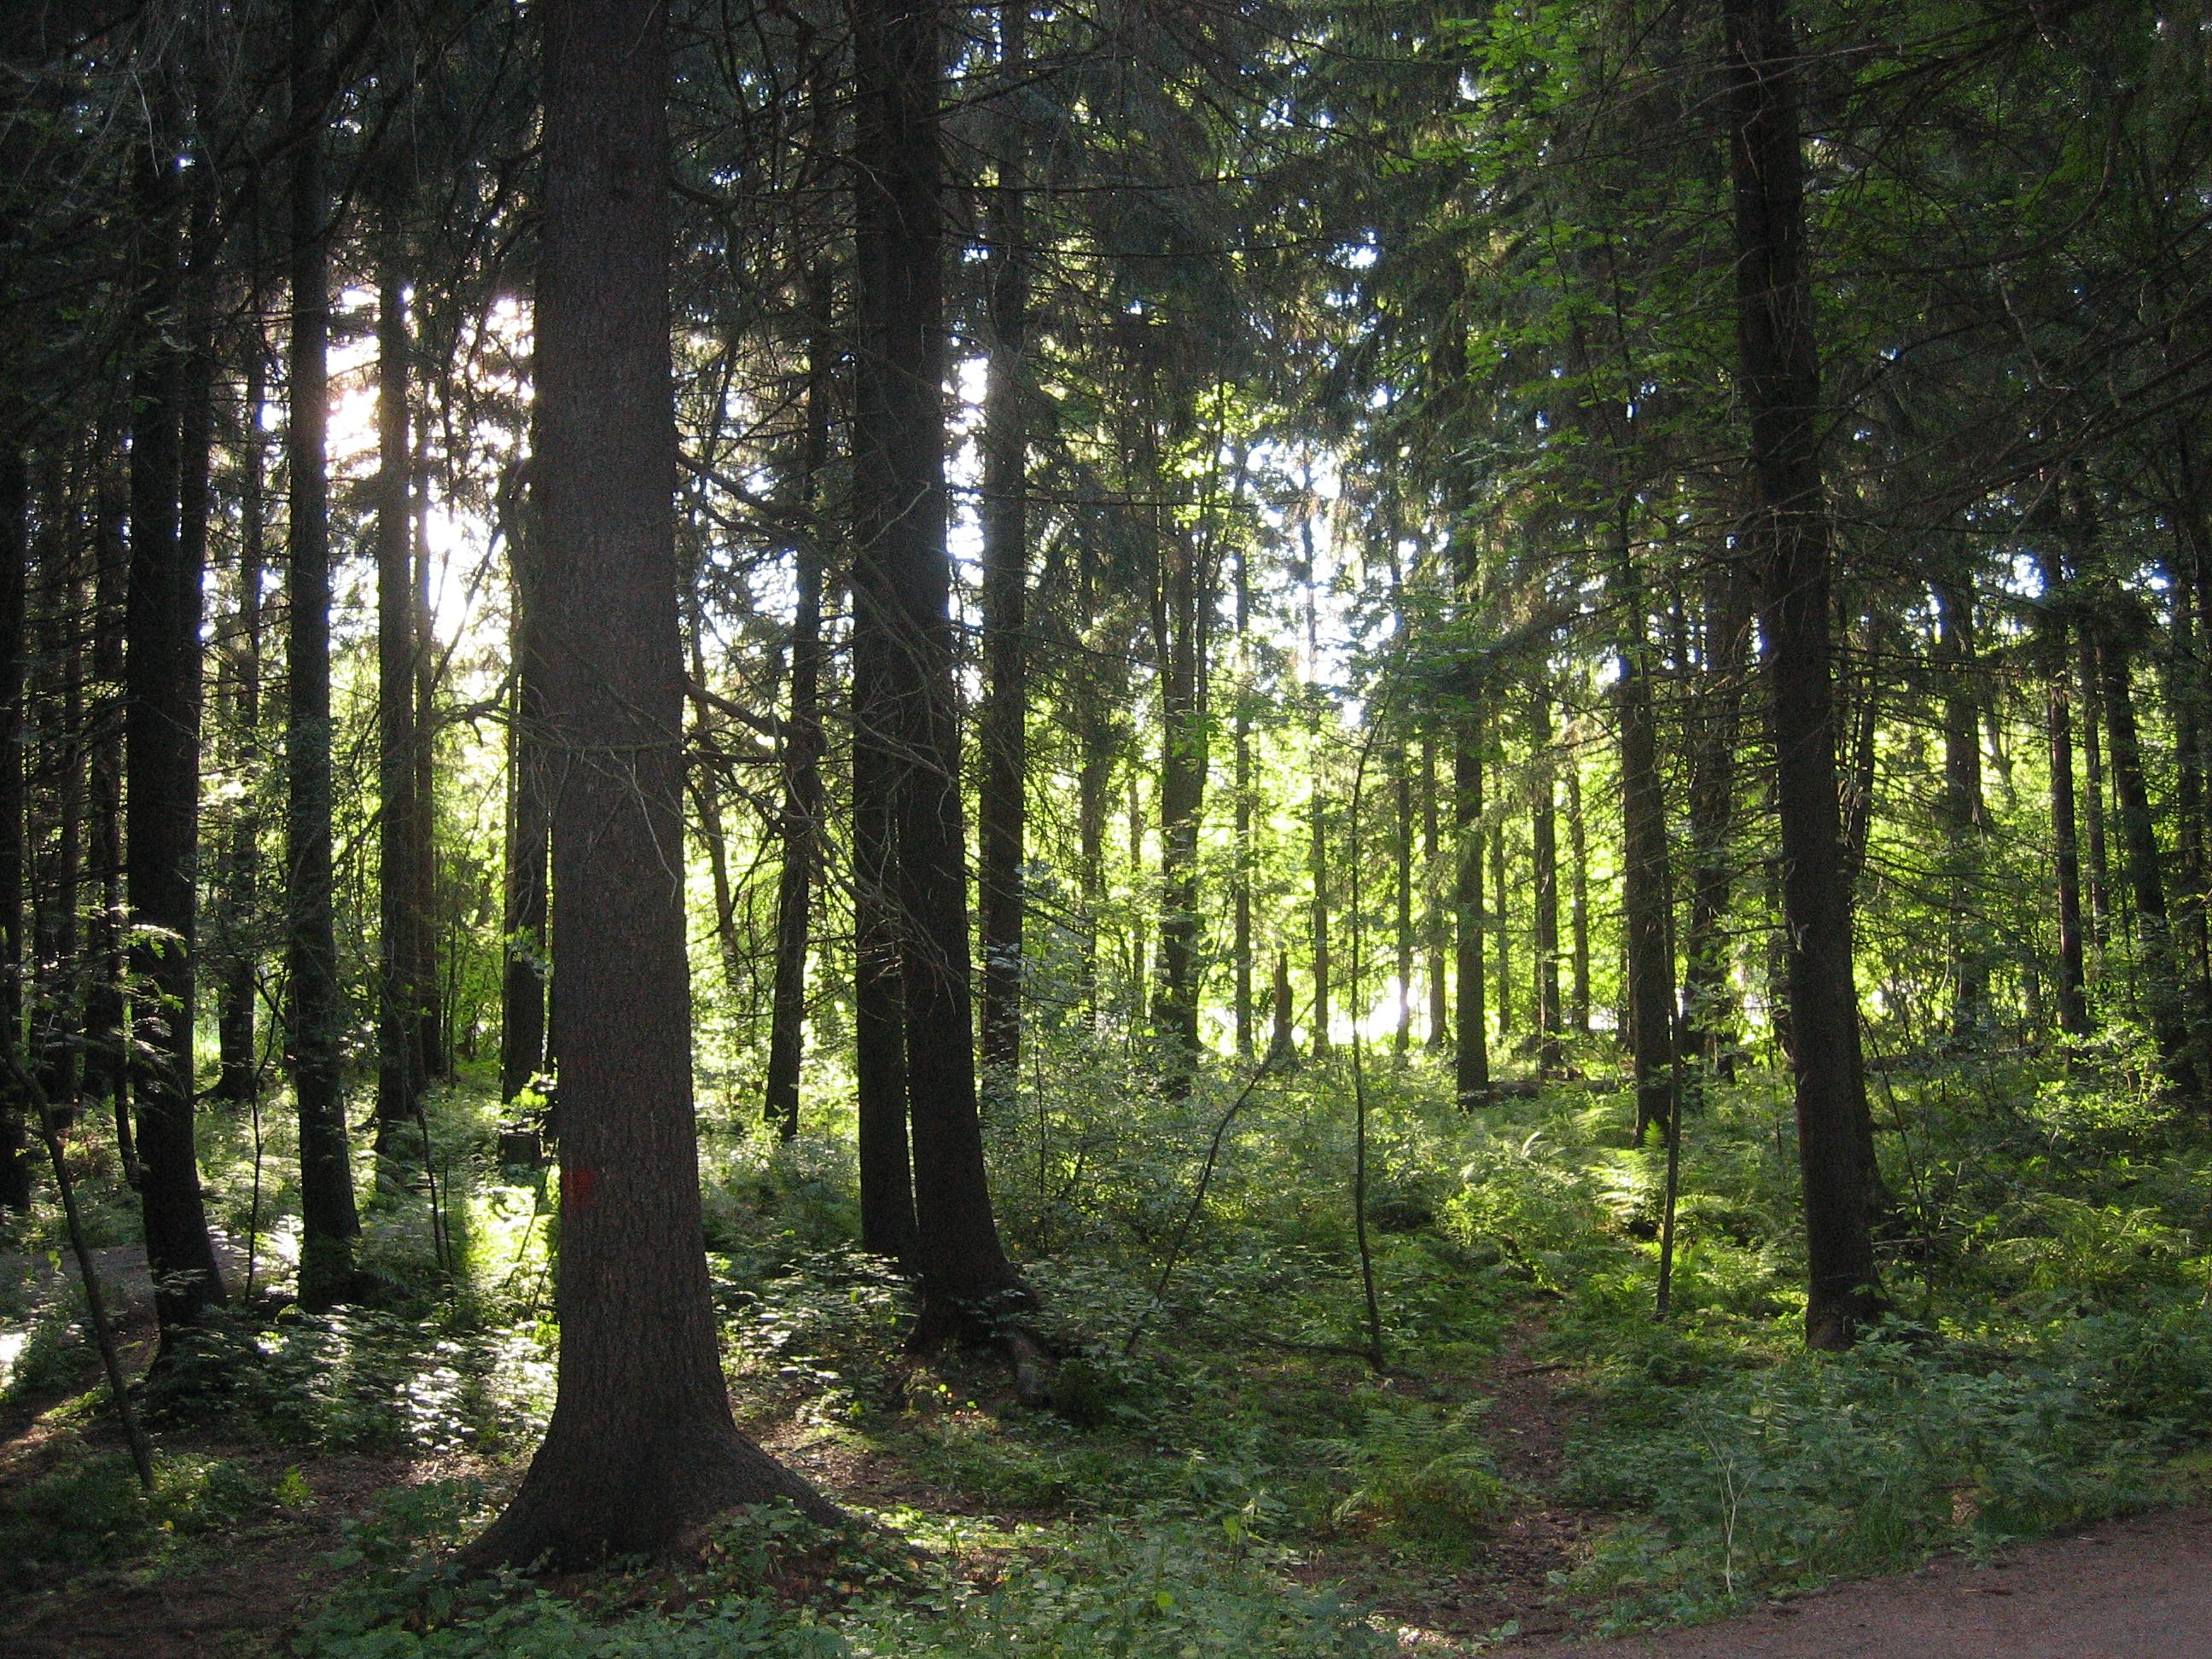 Central Park Helsinki (Wikipedia)